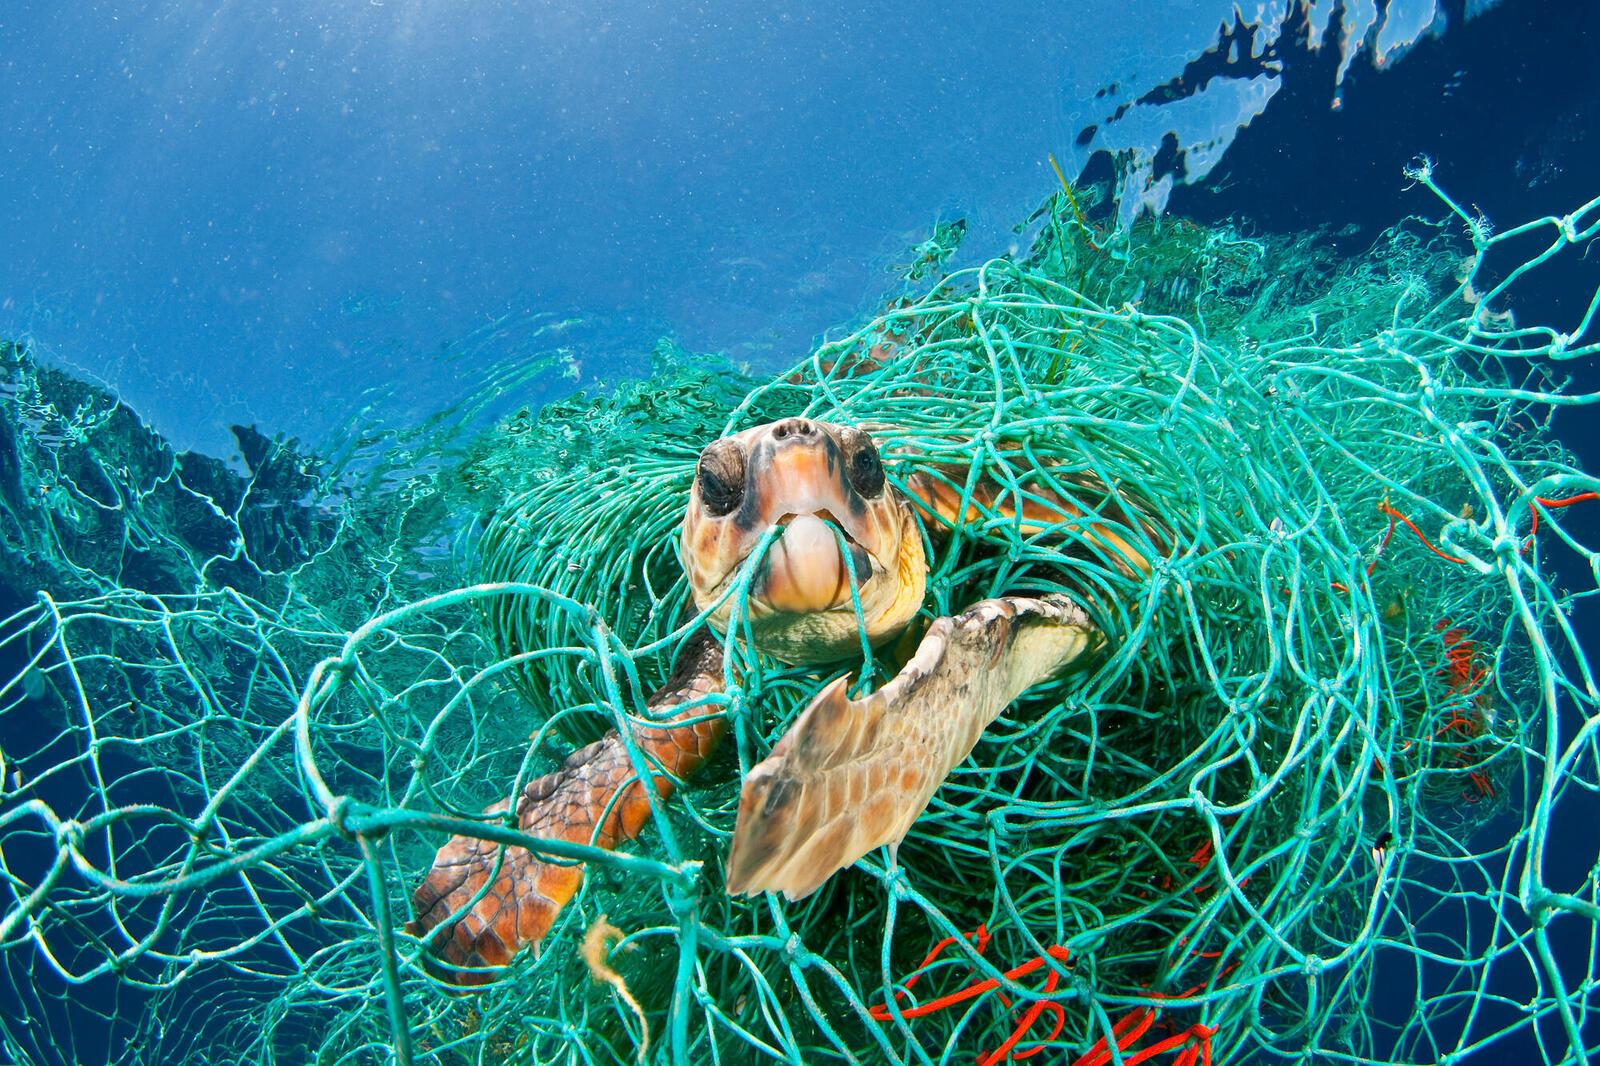 Turtle caught in net